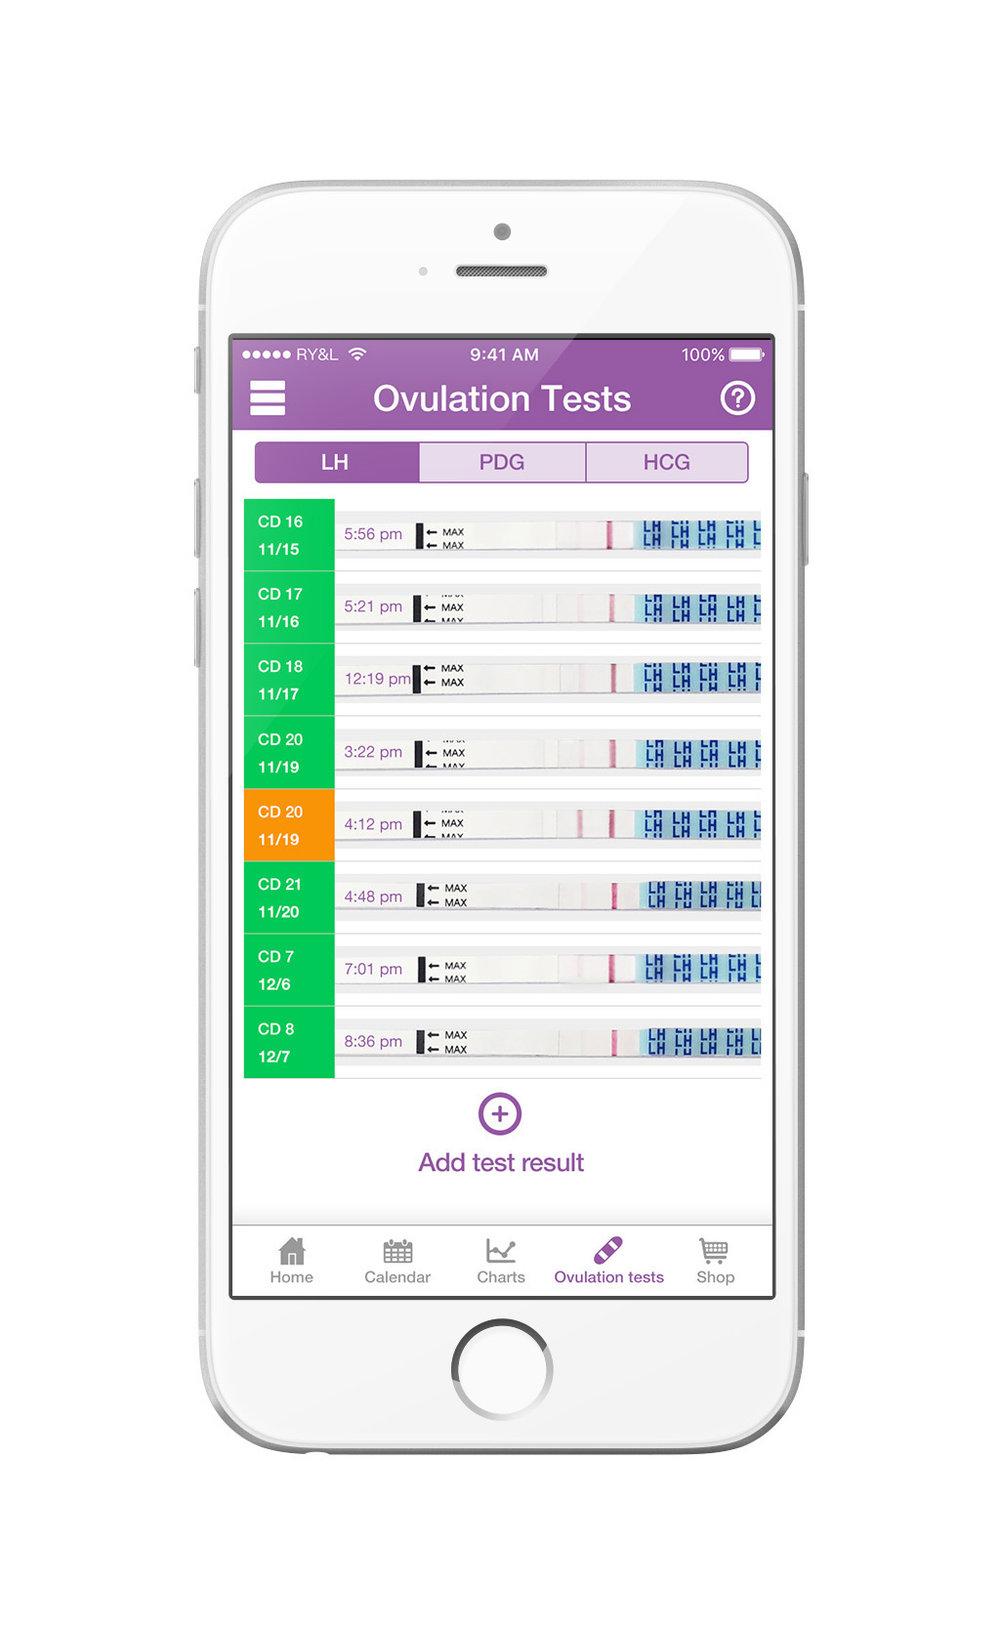 ovulation tests gallery-03.jpg